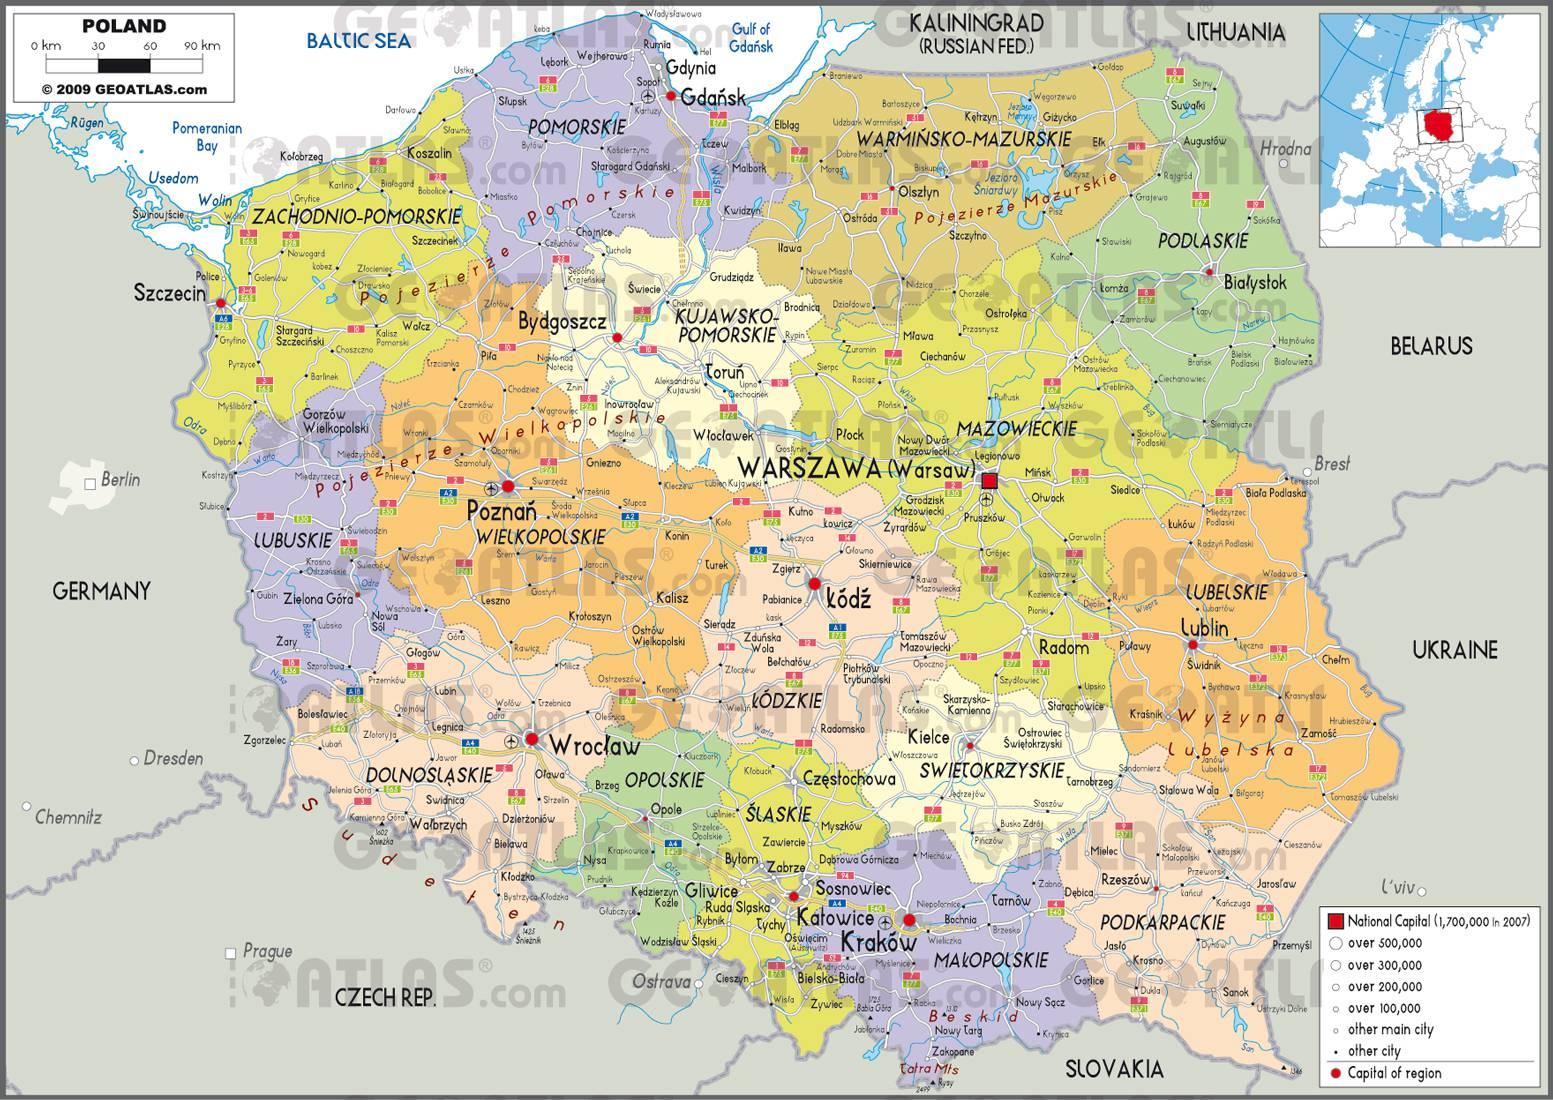 Carte administrative de la Pologne